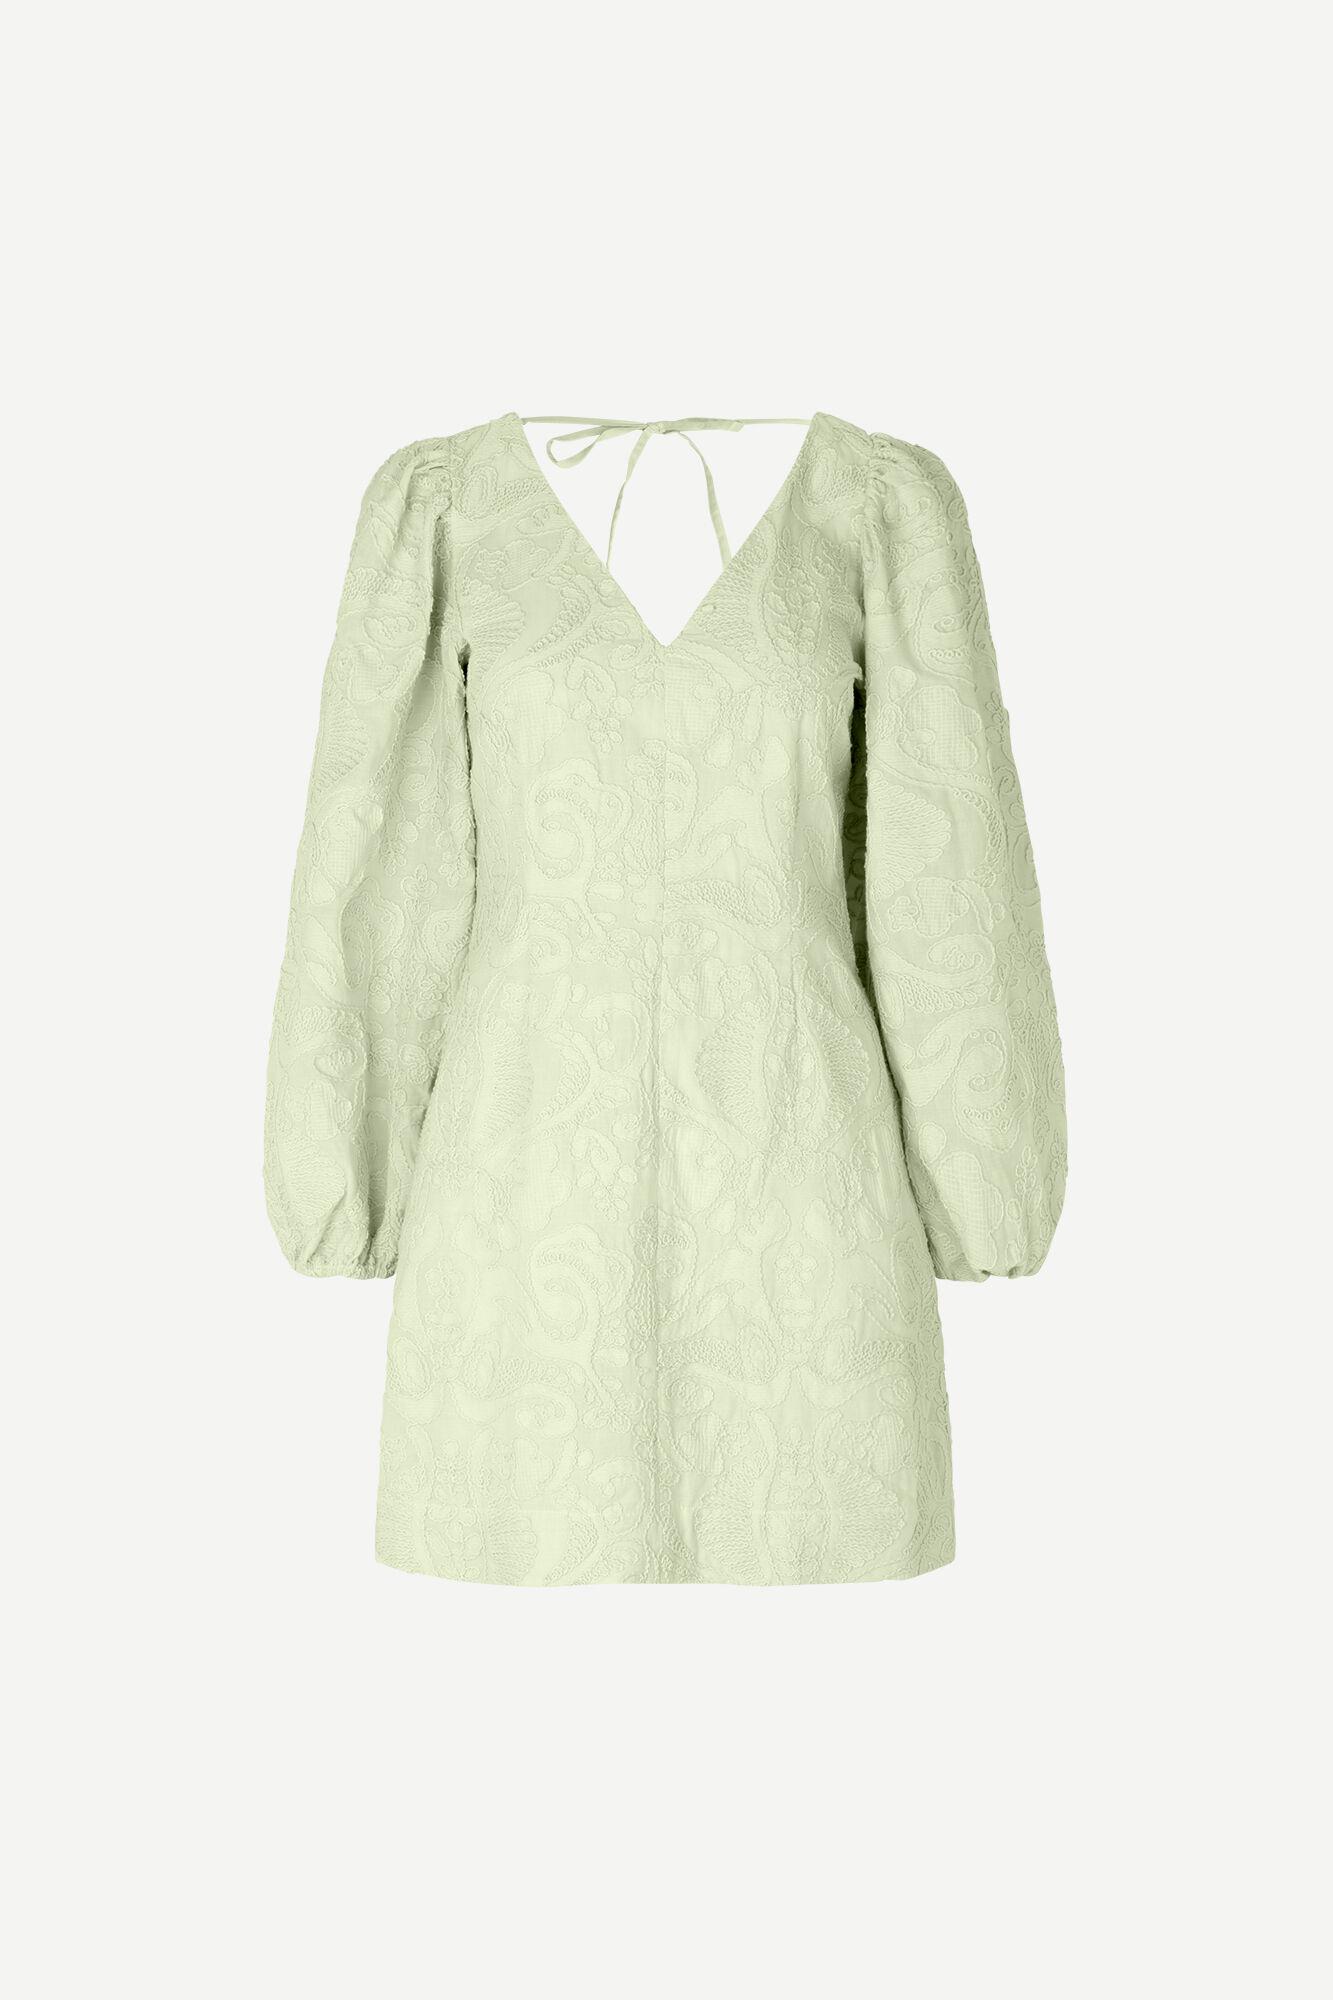 Anai dress 13089